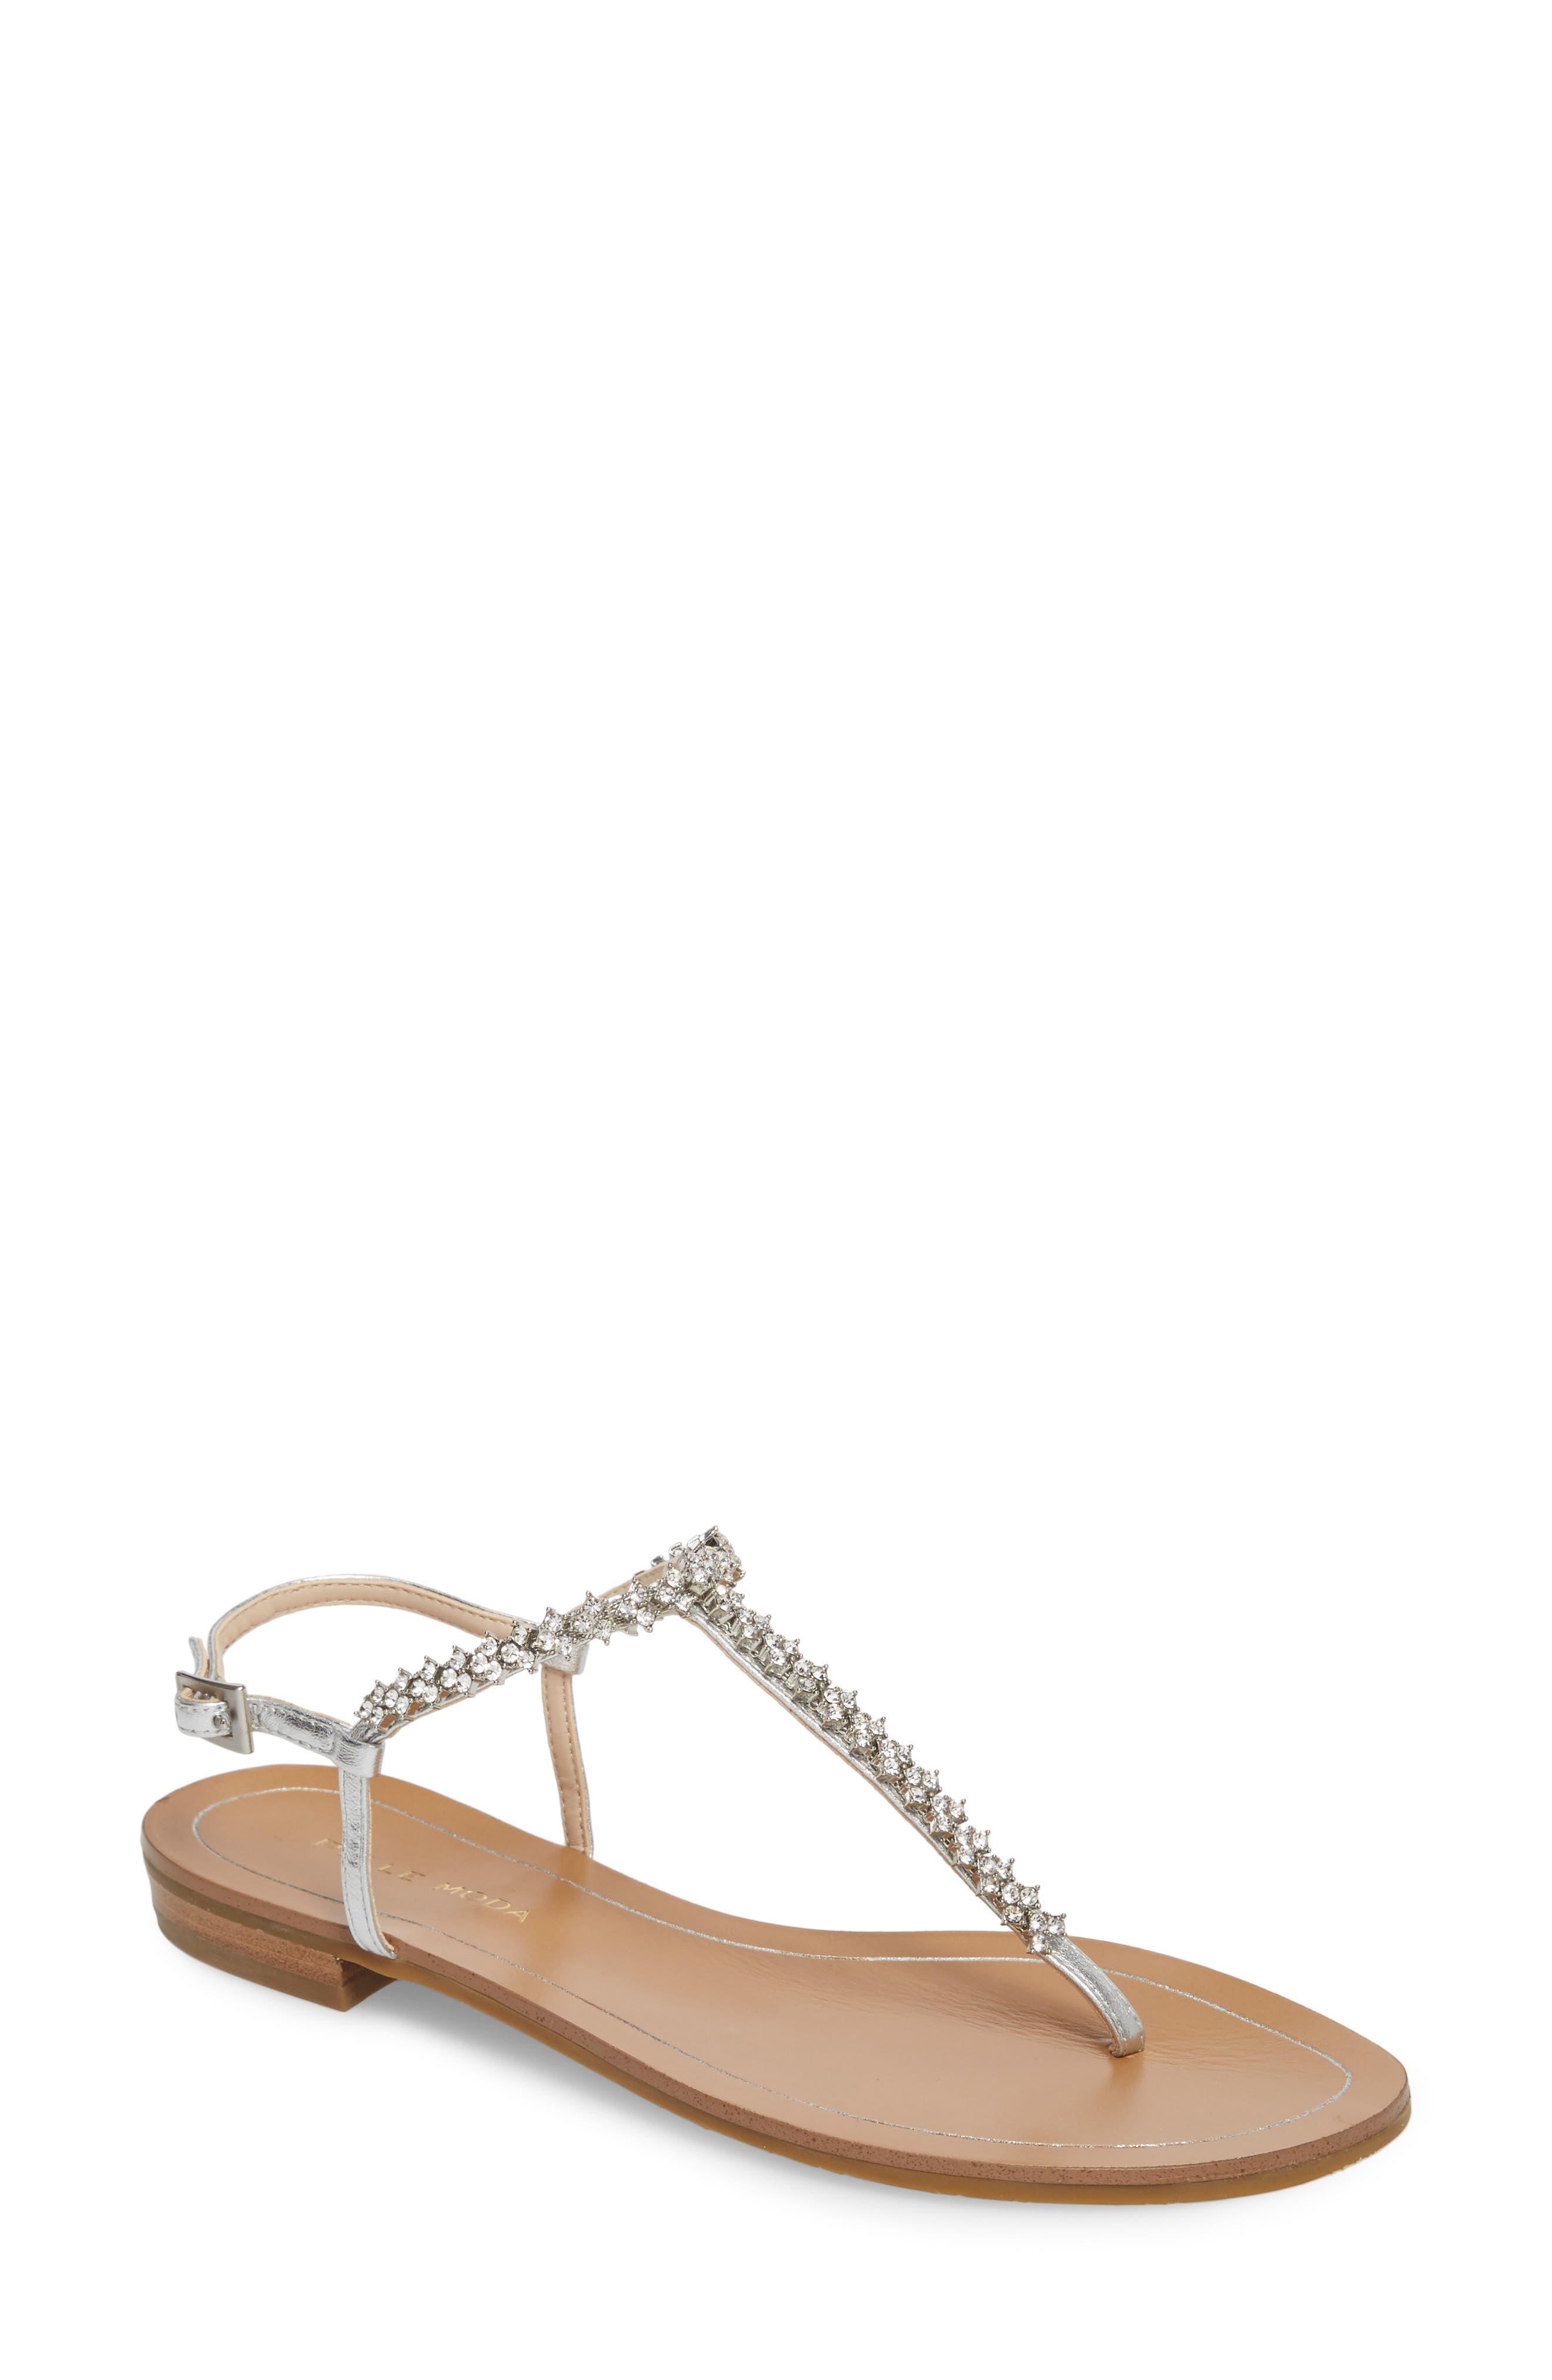 Alternate Image 1 Selected - Pelle Moda Baxley 4 Sandal (Women)